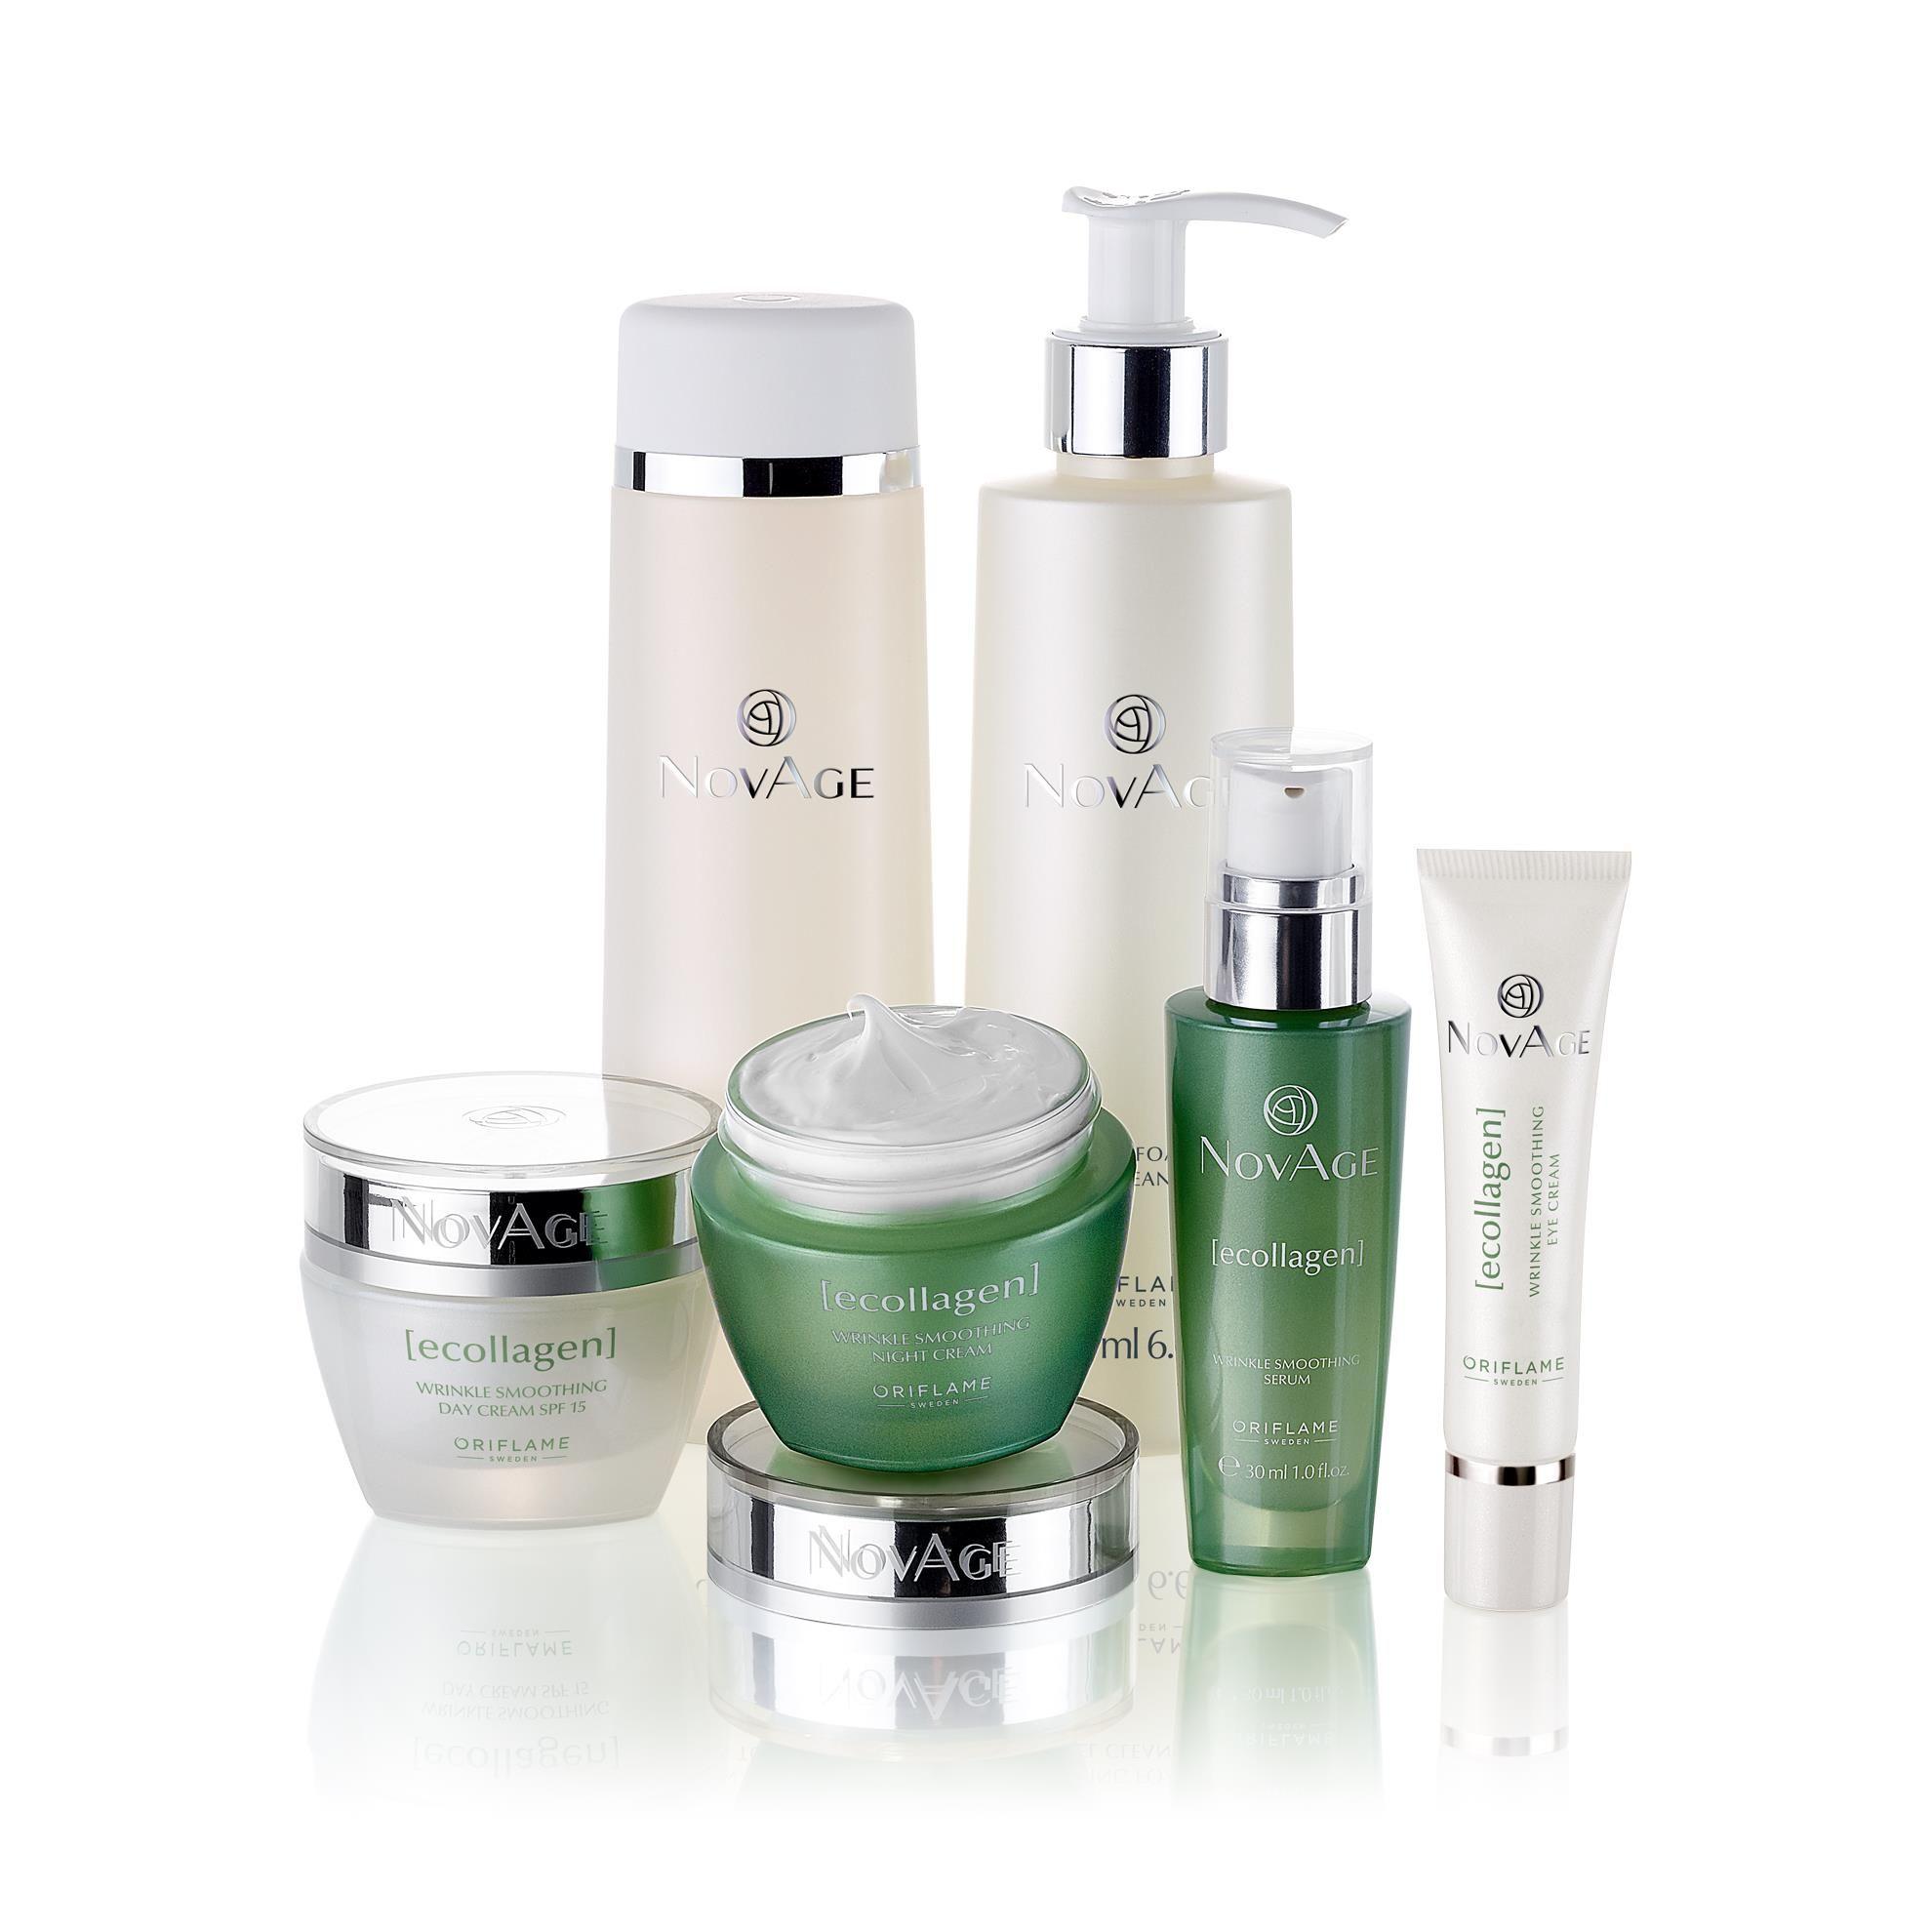 NovAge Ecollagen set Online shopping in Pakistan Skin